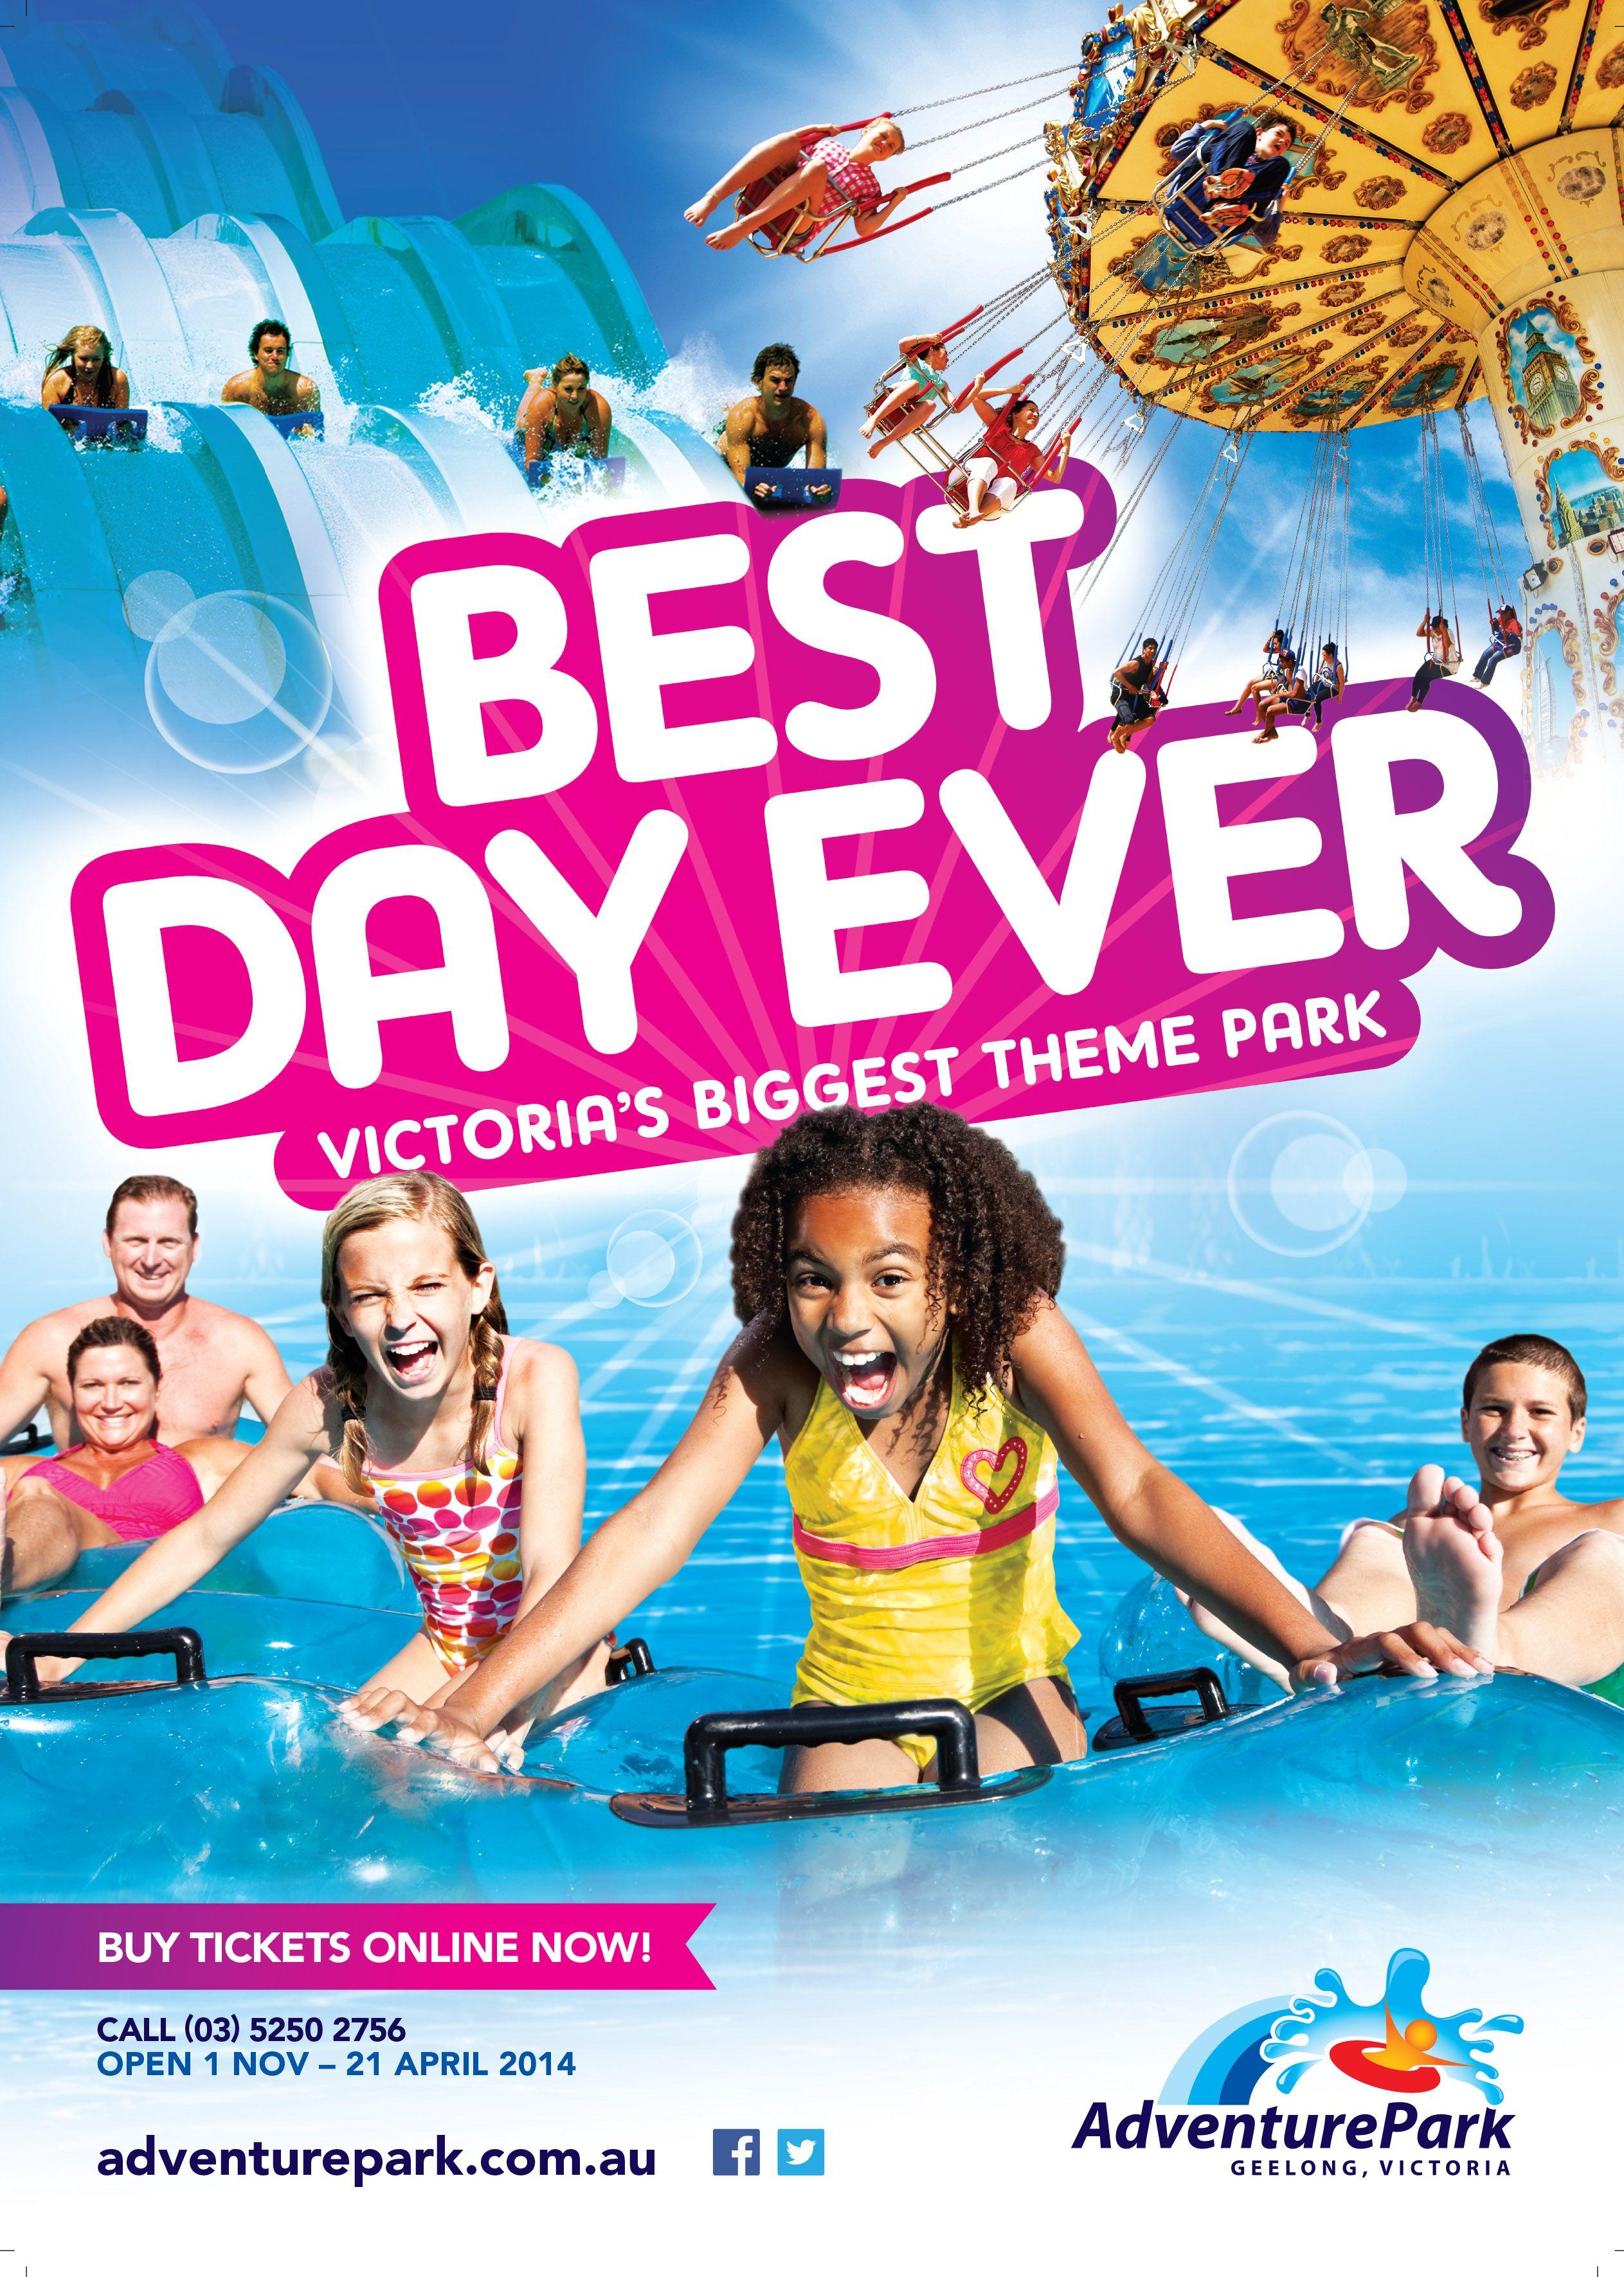 Adventure Park, Press advert design Advertising